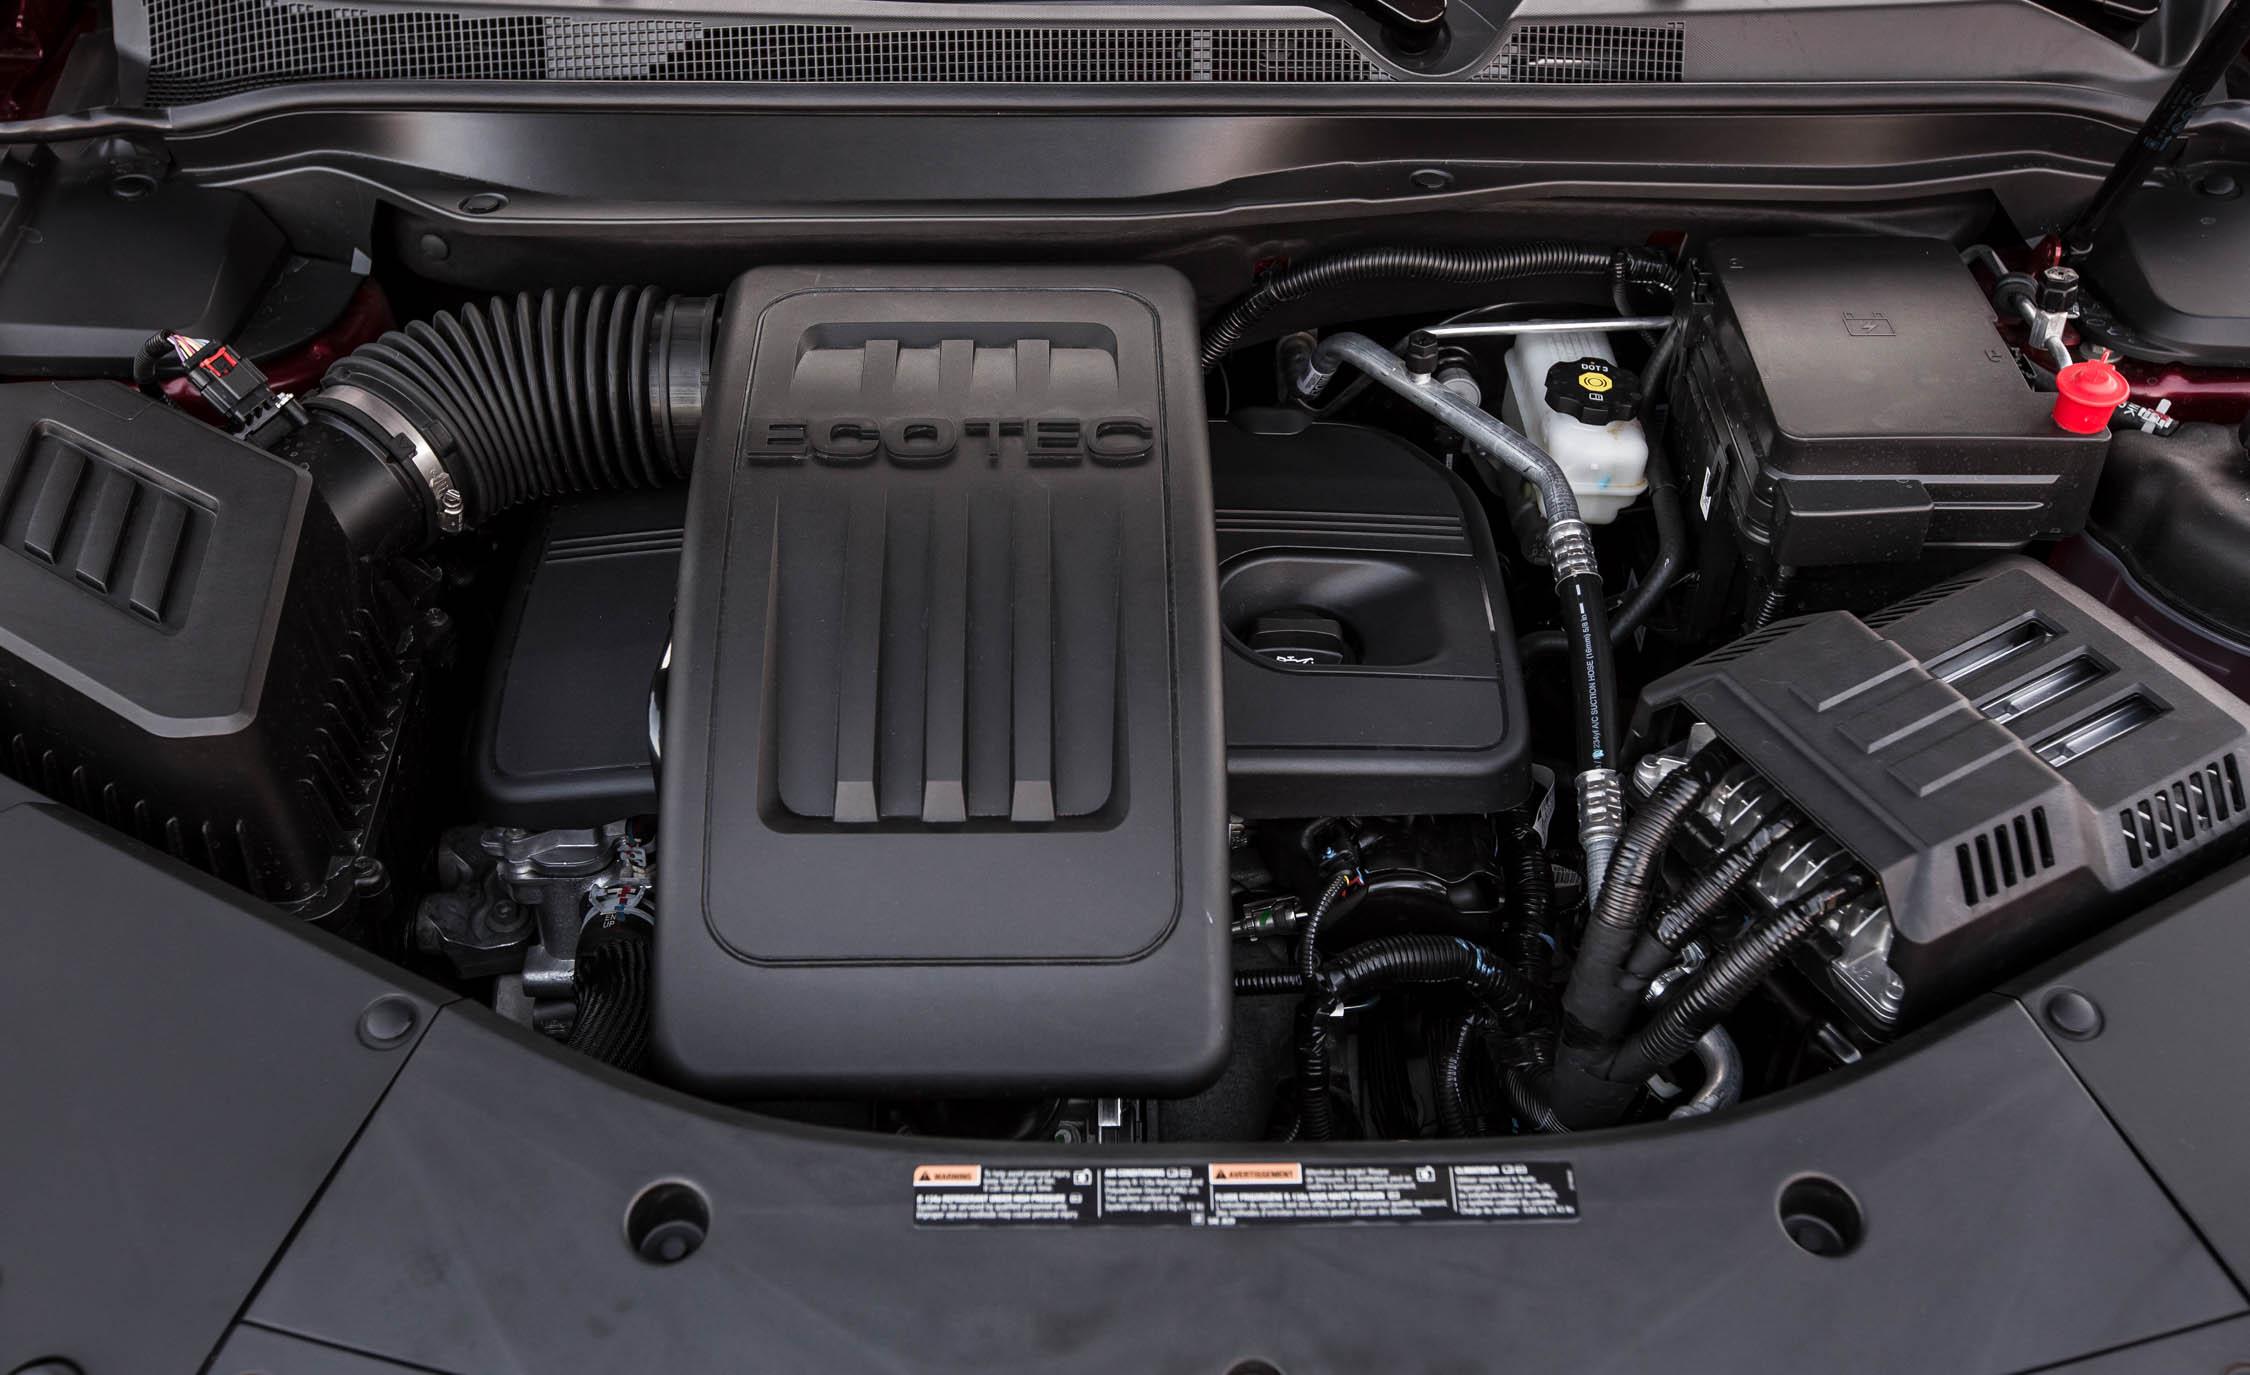 2016 Chevrolet Equinox LTZ  (Photo 25 of 25)